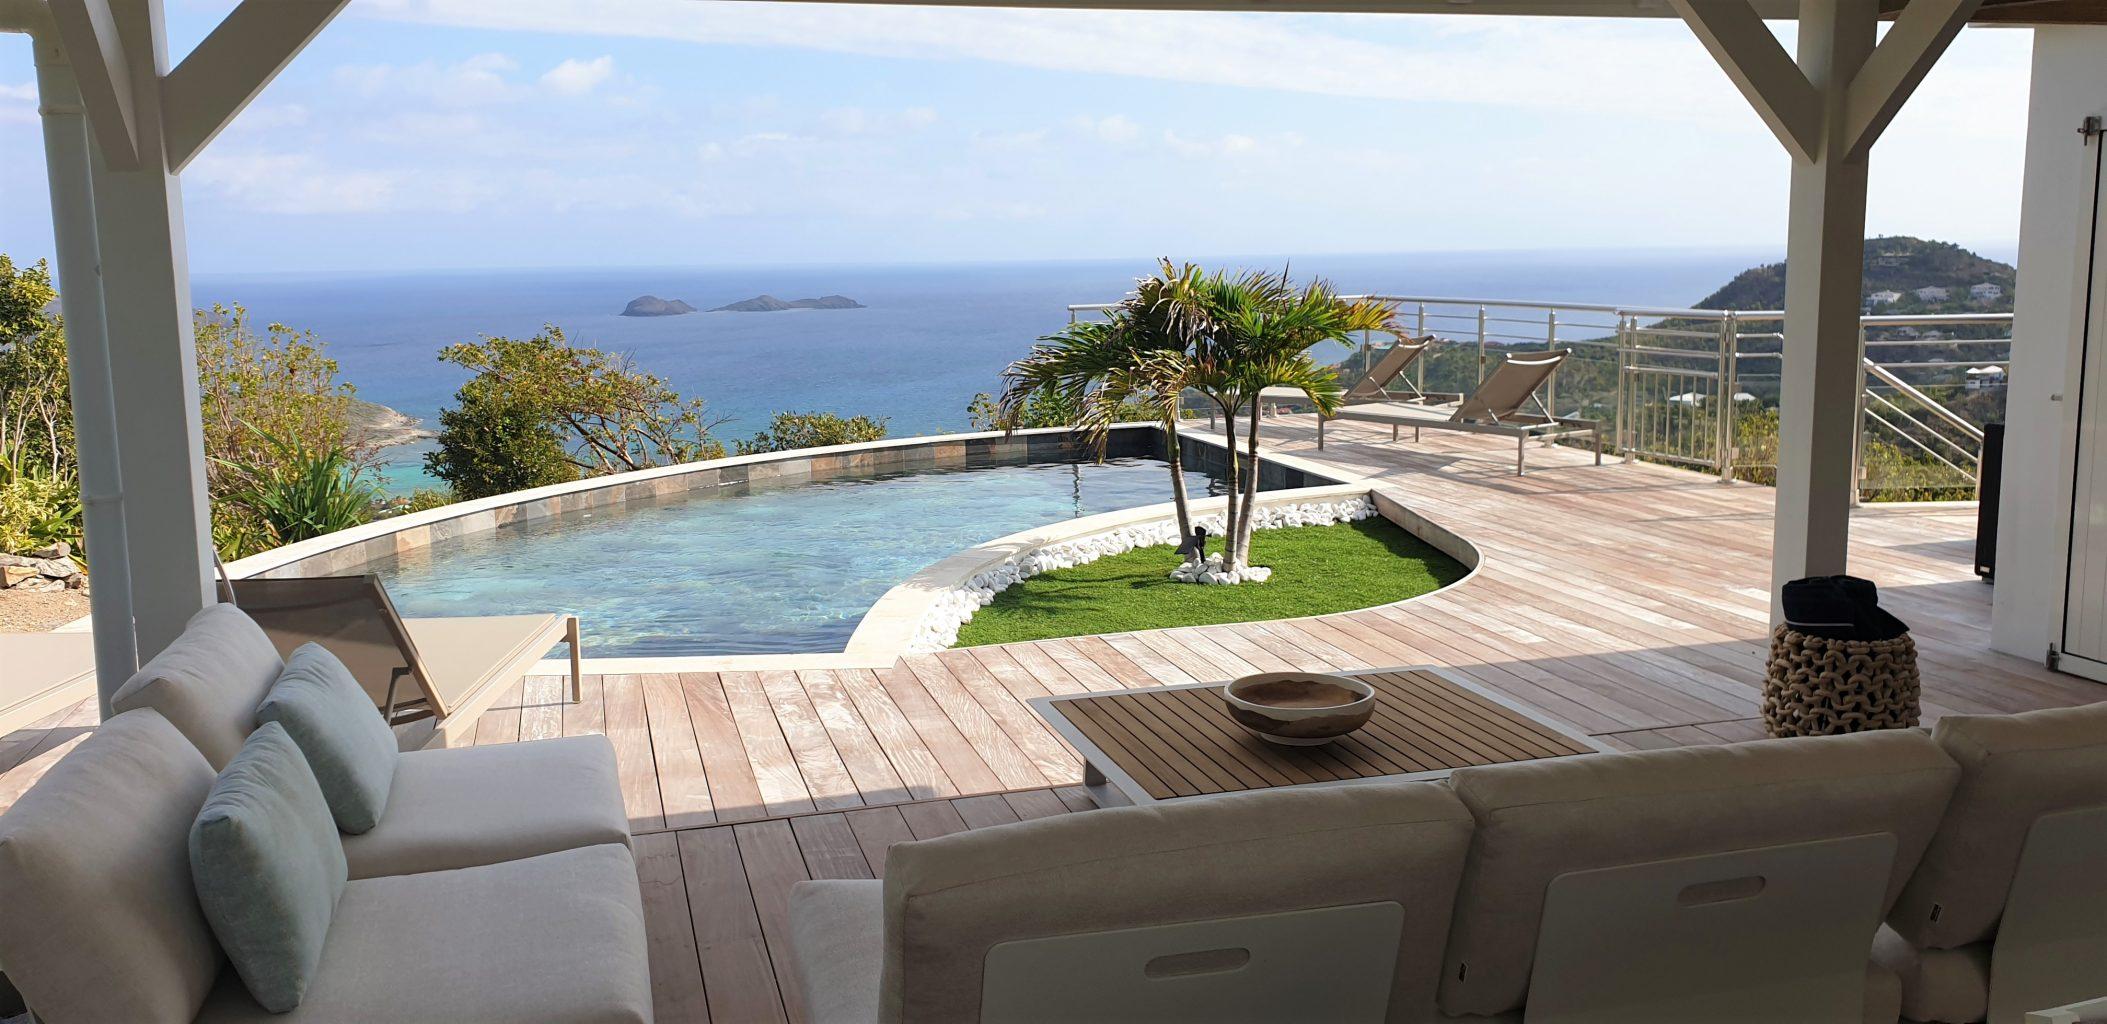 Villa Marris - Modern Villa Rent St Barth Lurin Sea view - Swimming pool and sea view